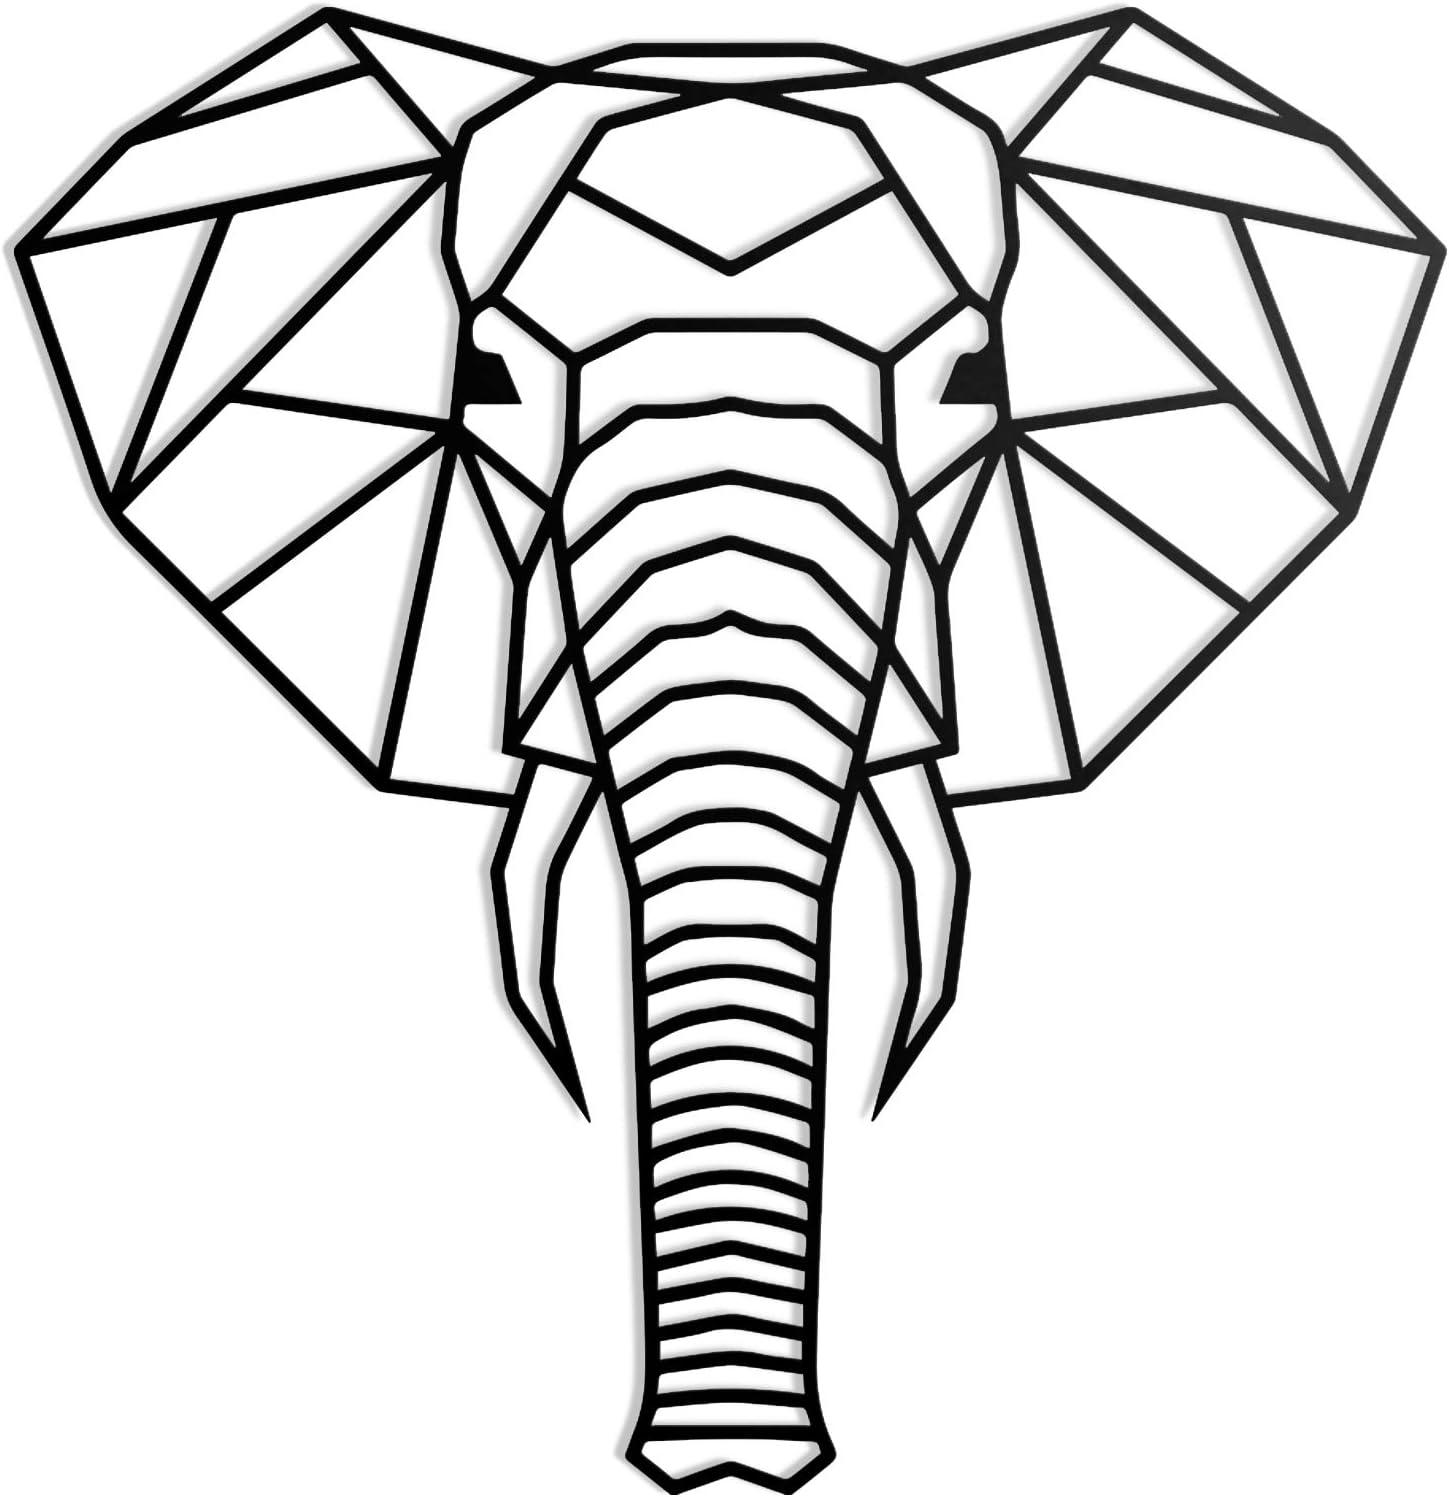 Elefantenkopf//Elefant 74 x 71 cm 1 kg unsichtbare Befestigung Stahl Made in Germany Rerum /& Consilium geometrischer Elefantenkopf XL in Schwarz